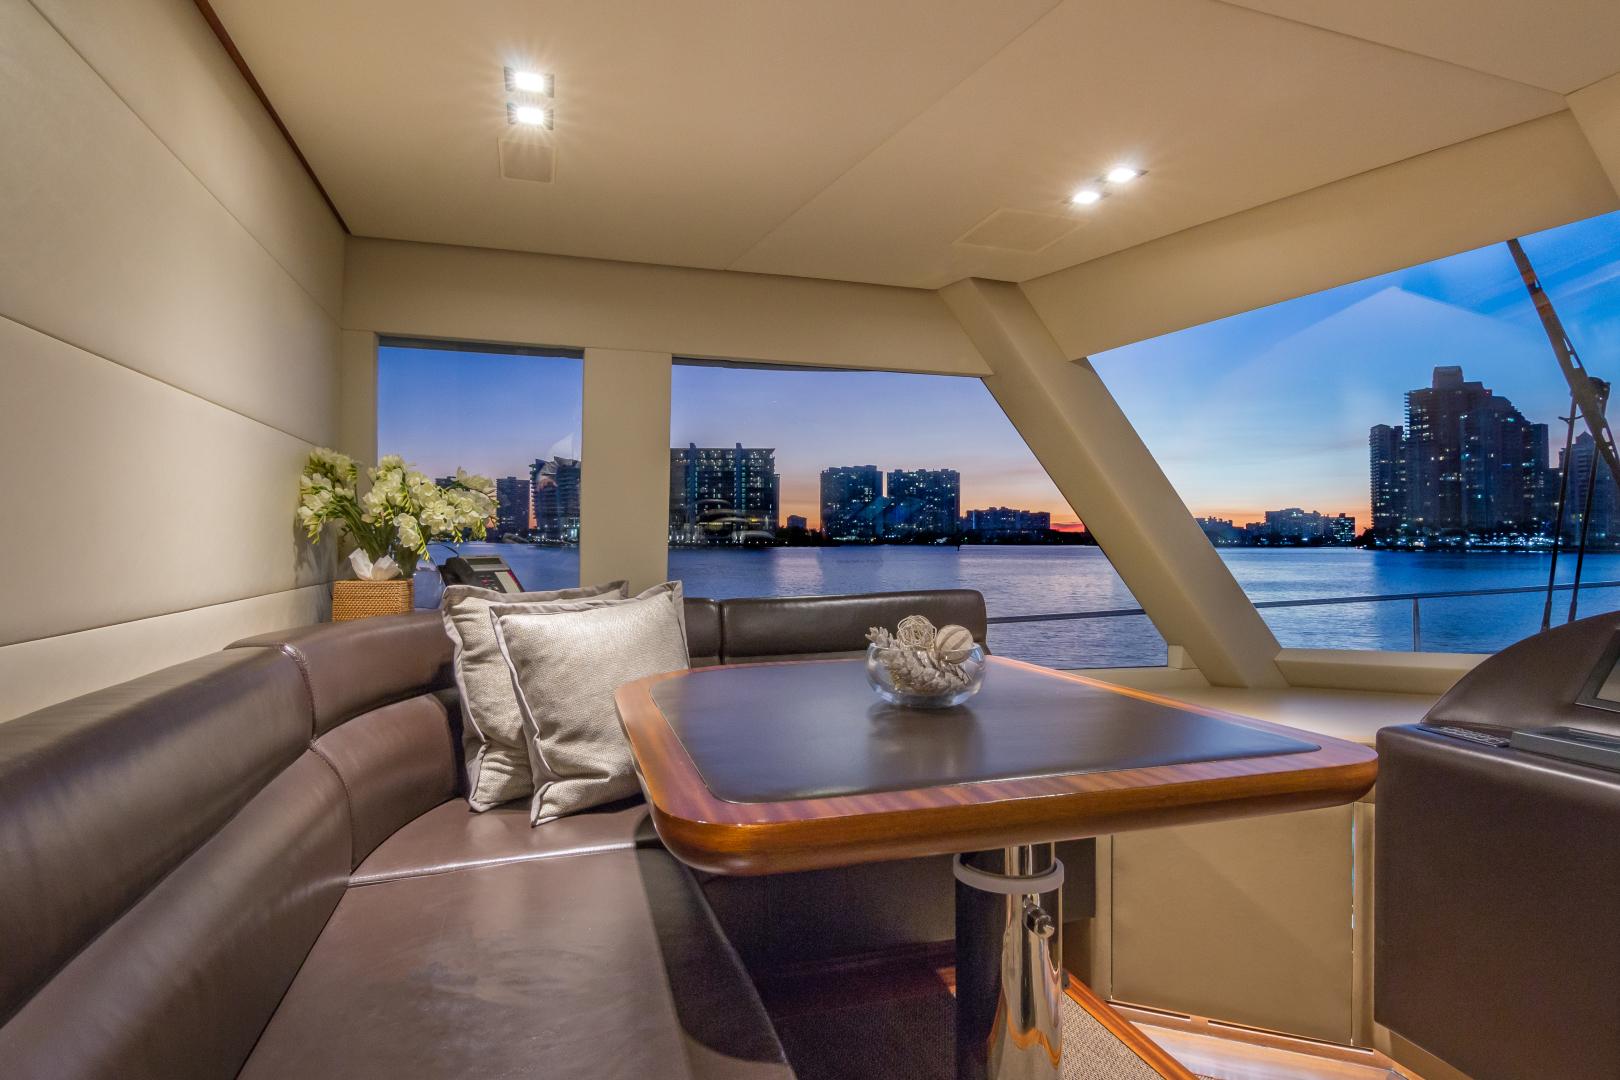 Vicem-Raised Pilot House 2013-MONI FORT LAUDERDALE-Florida-United States-WHEELHOUSE-1394869 | Thumbnail